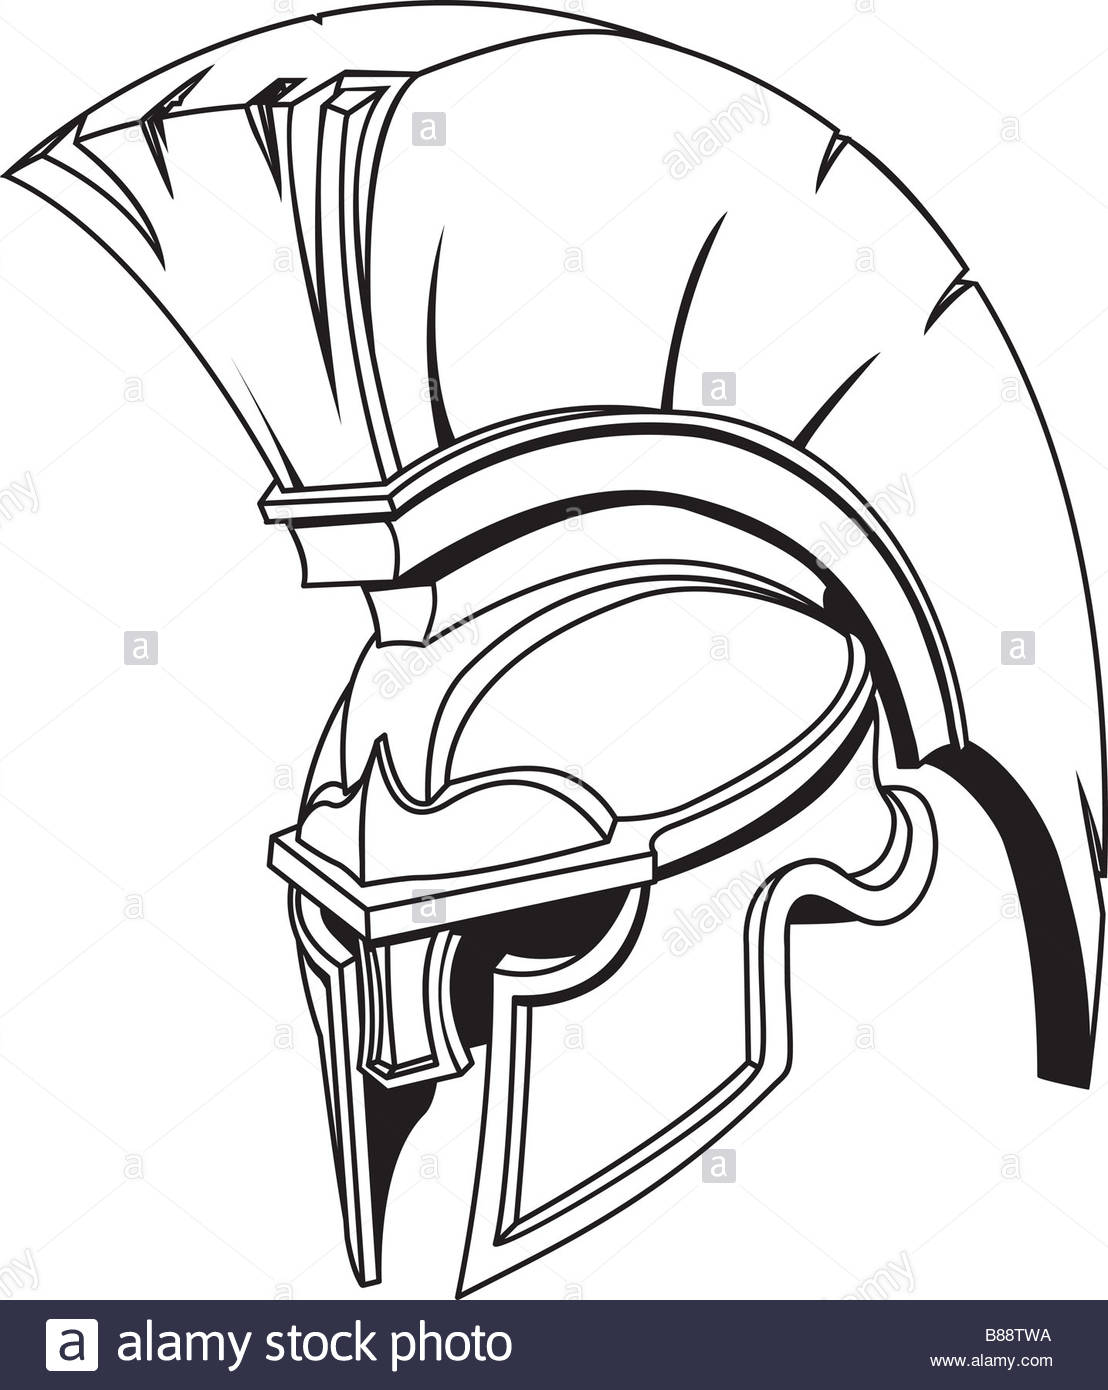 005010cd4e9 1108x1390 An Illustration Of Spartan Roman Greek Trojan Or Gladiator Helmet